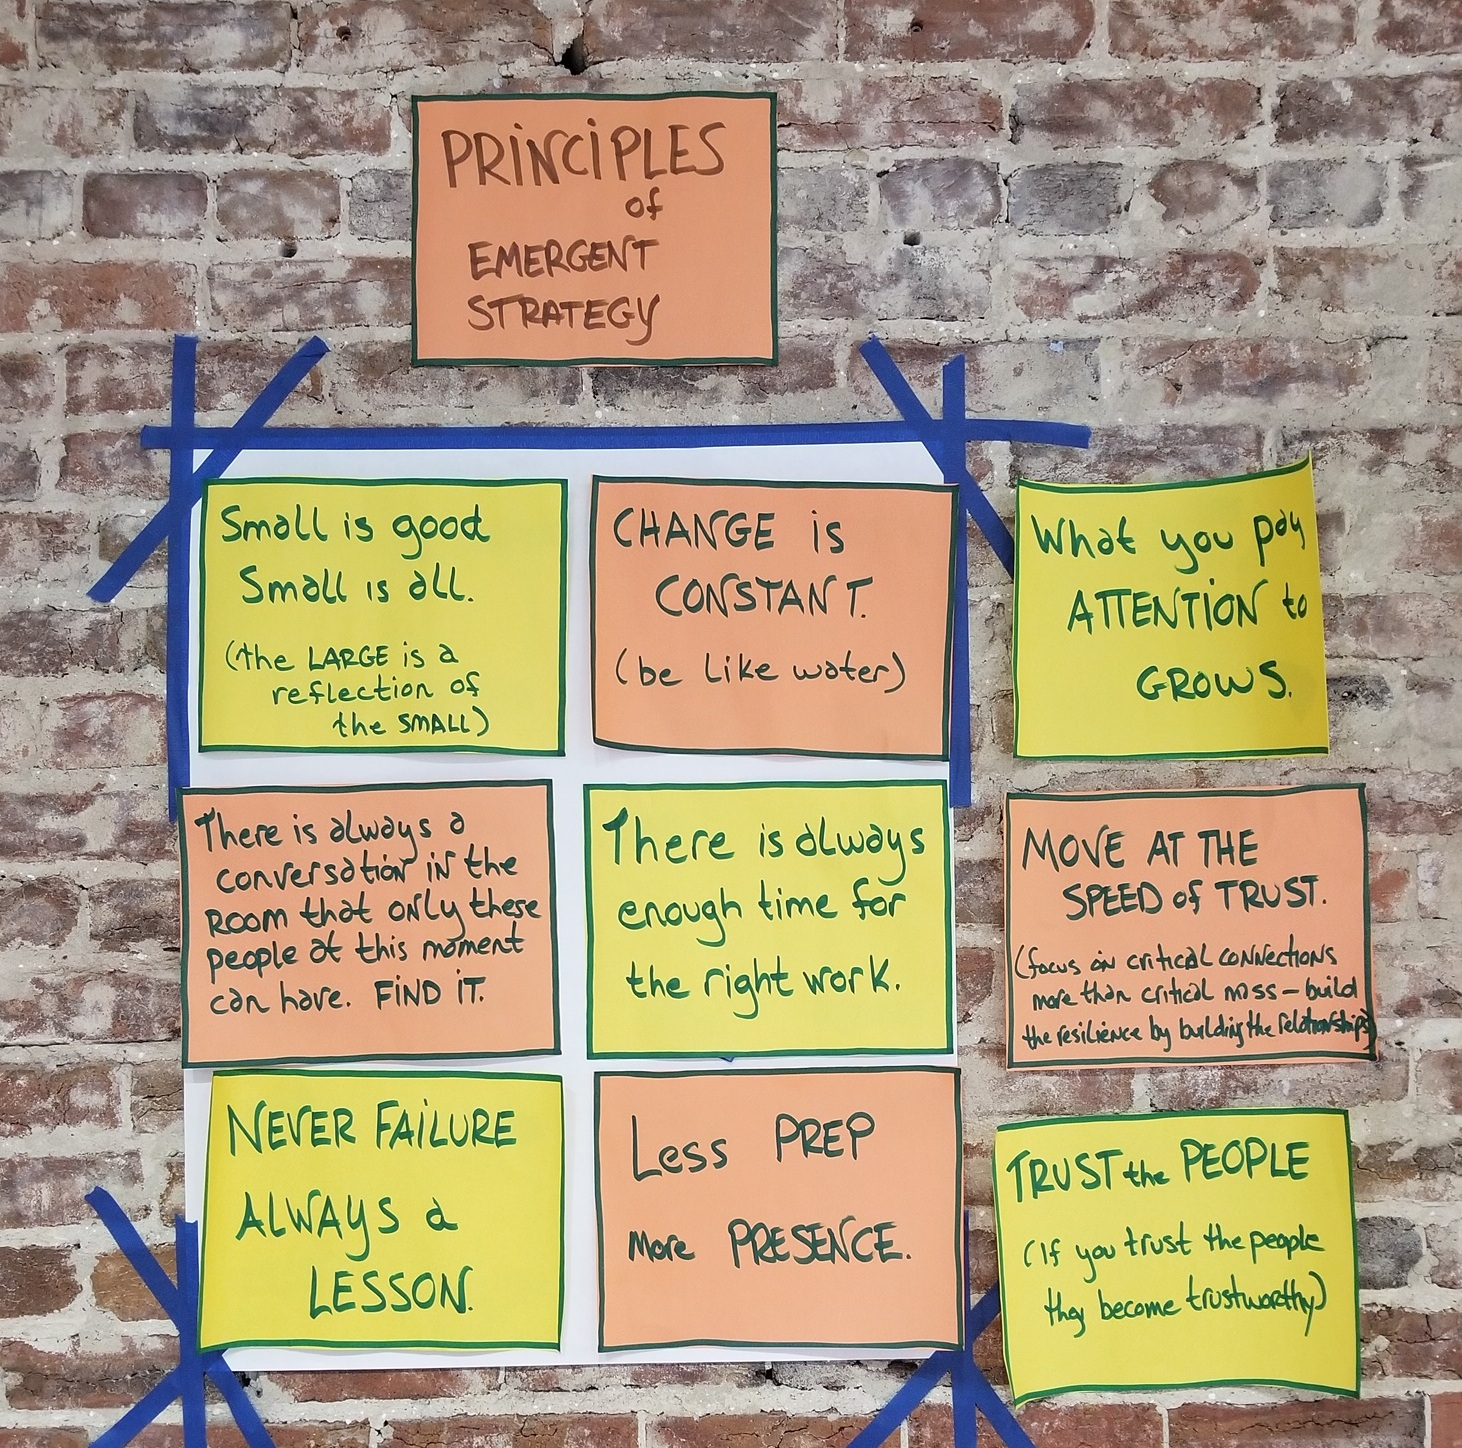 principlesofemergentstrategy